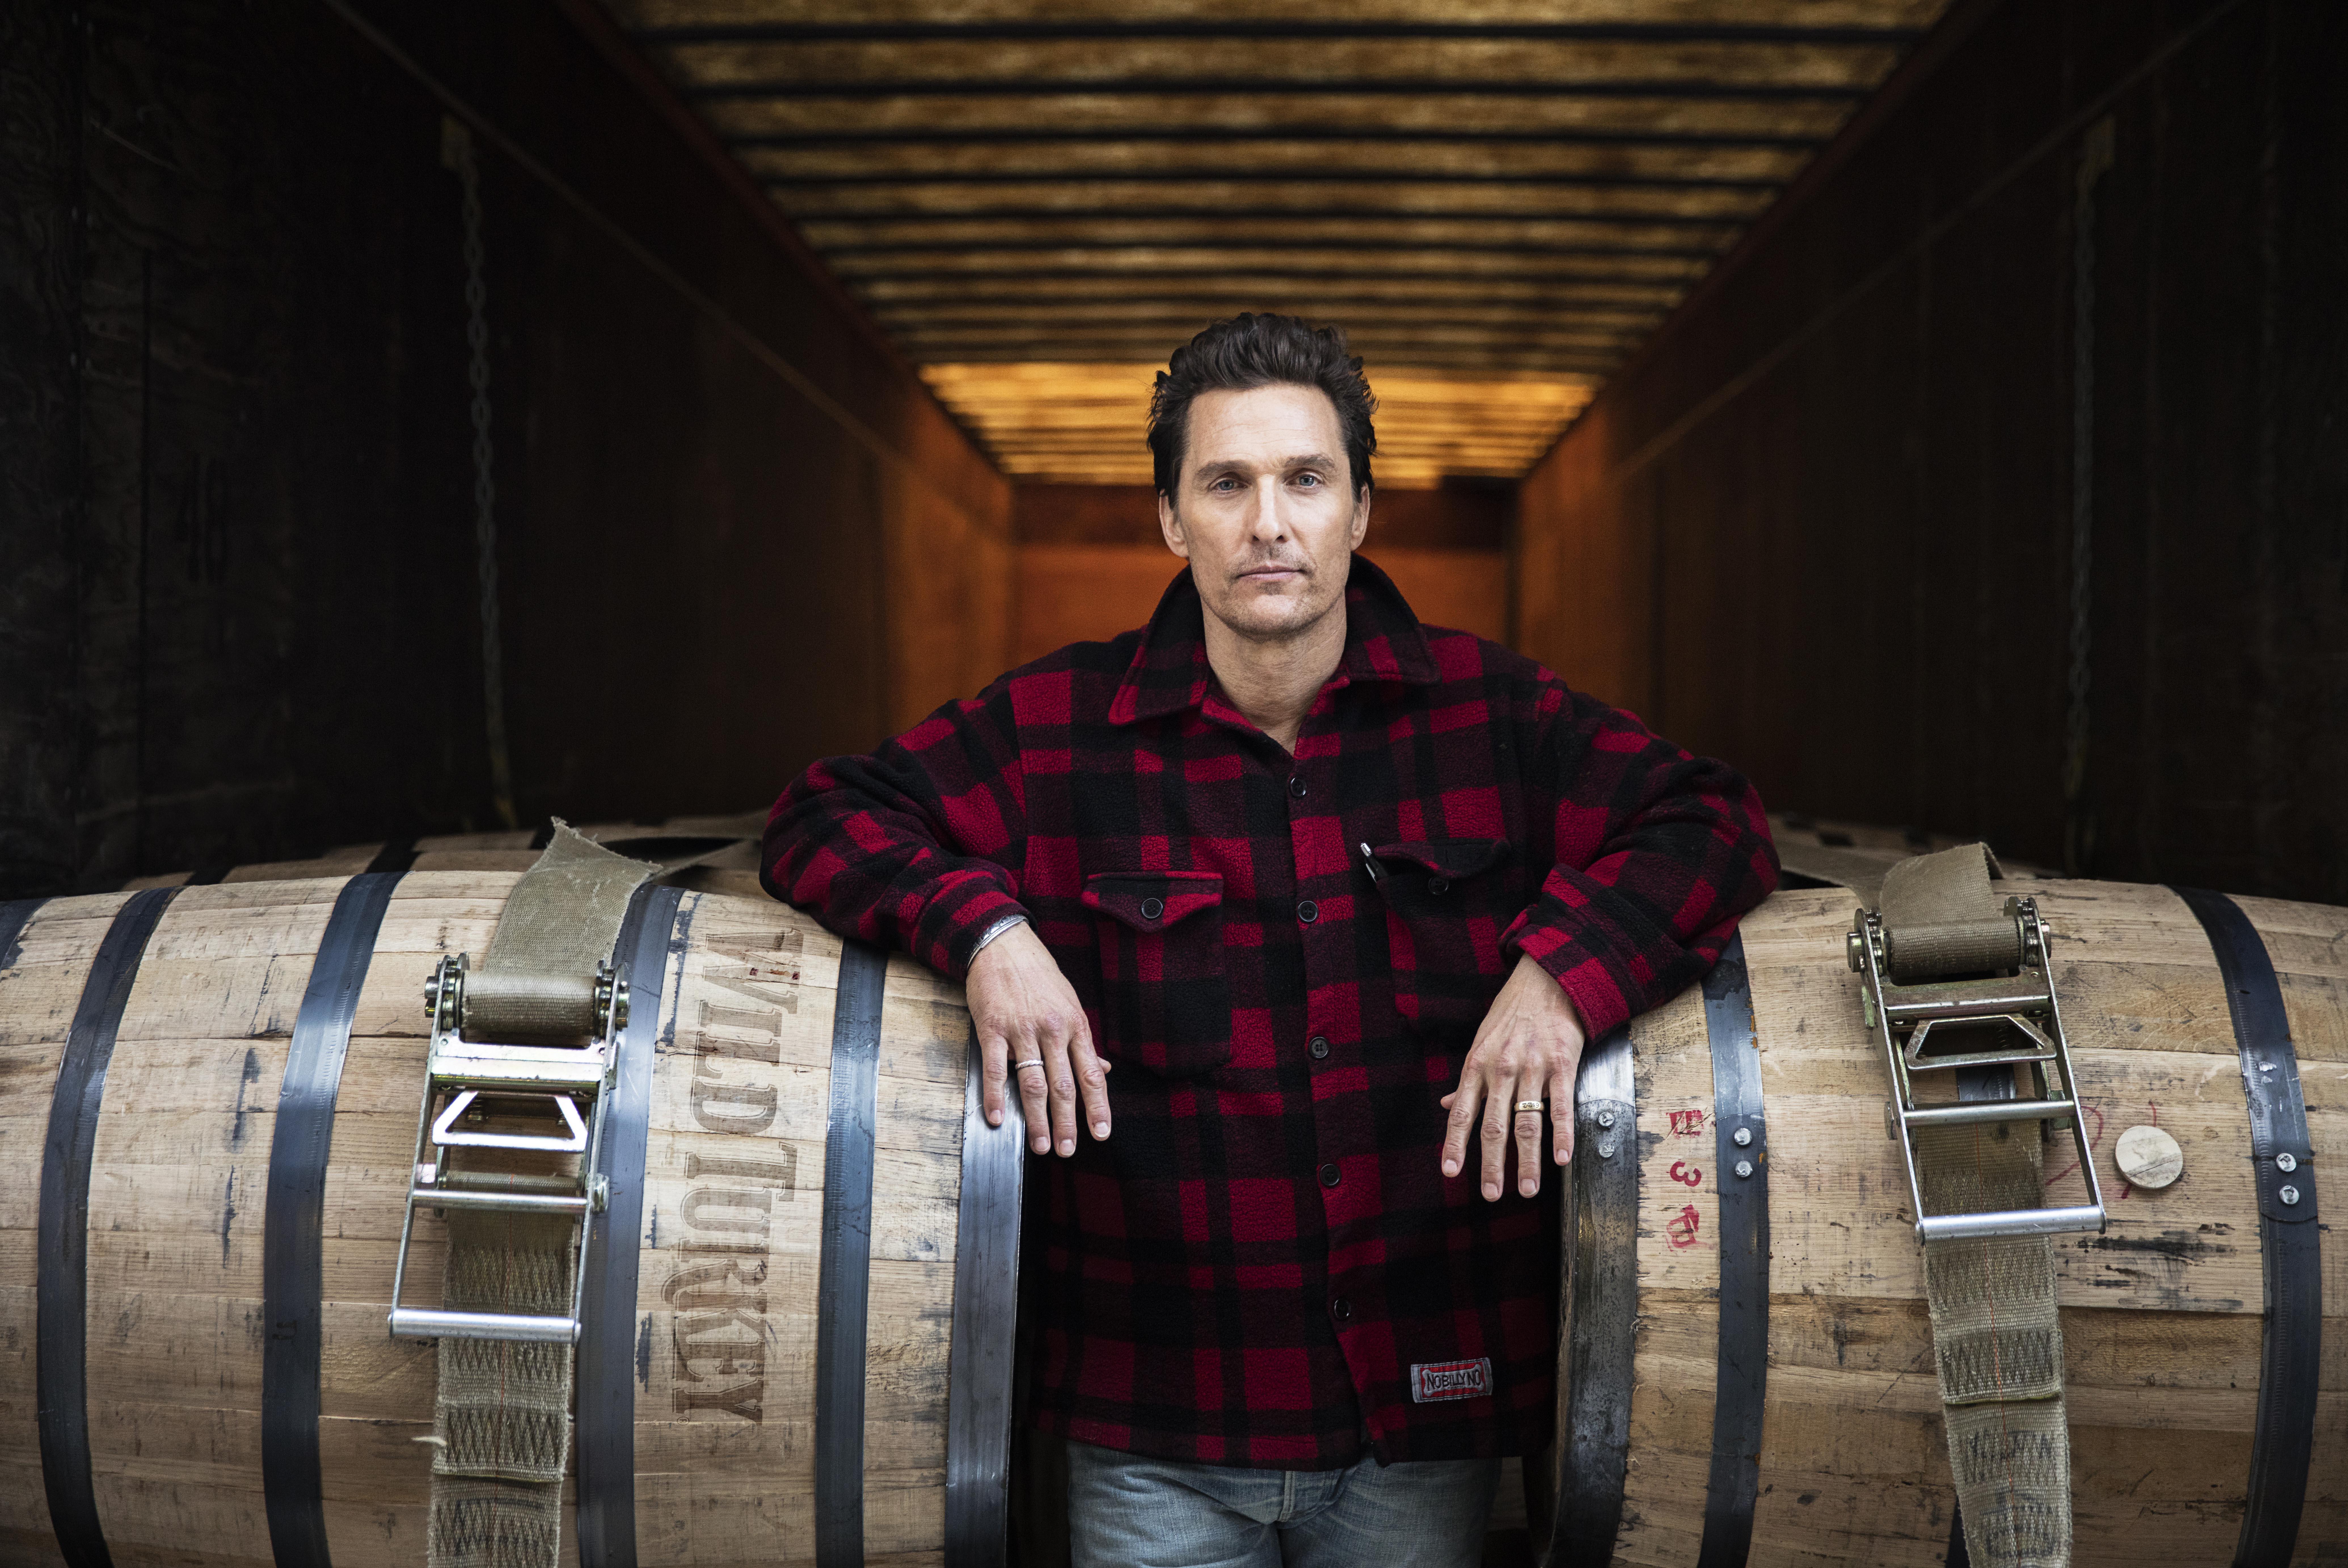 Academy Award-winning actor Matthew McConaughey is now creative director of bourbon maker Wild Turkey.